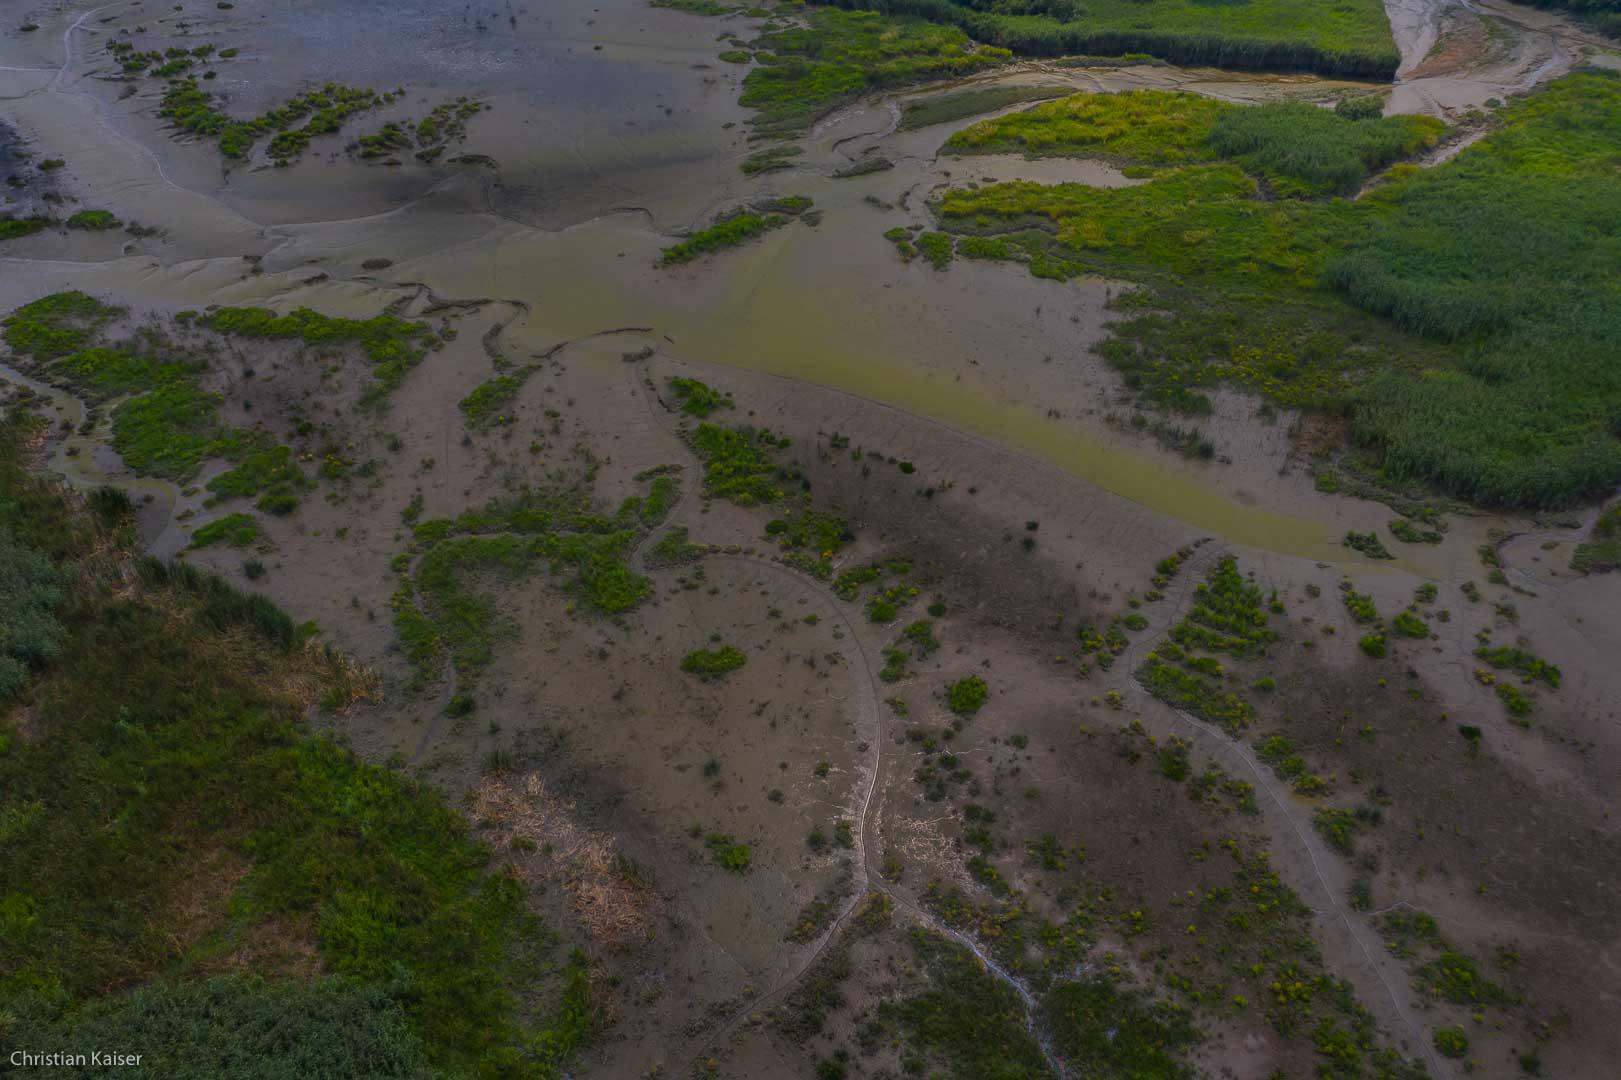 Suesswasserwatt, tidal area, Biotop, Ebbe, Niedrigwasser, Priele